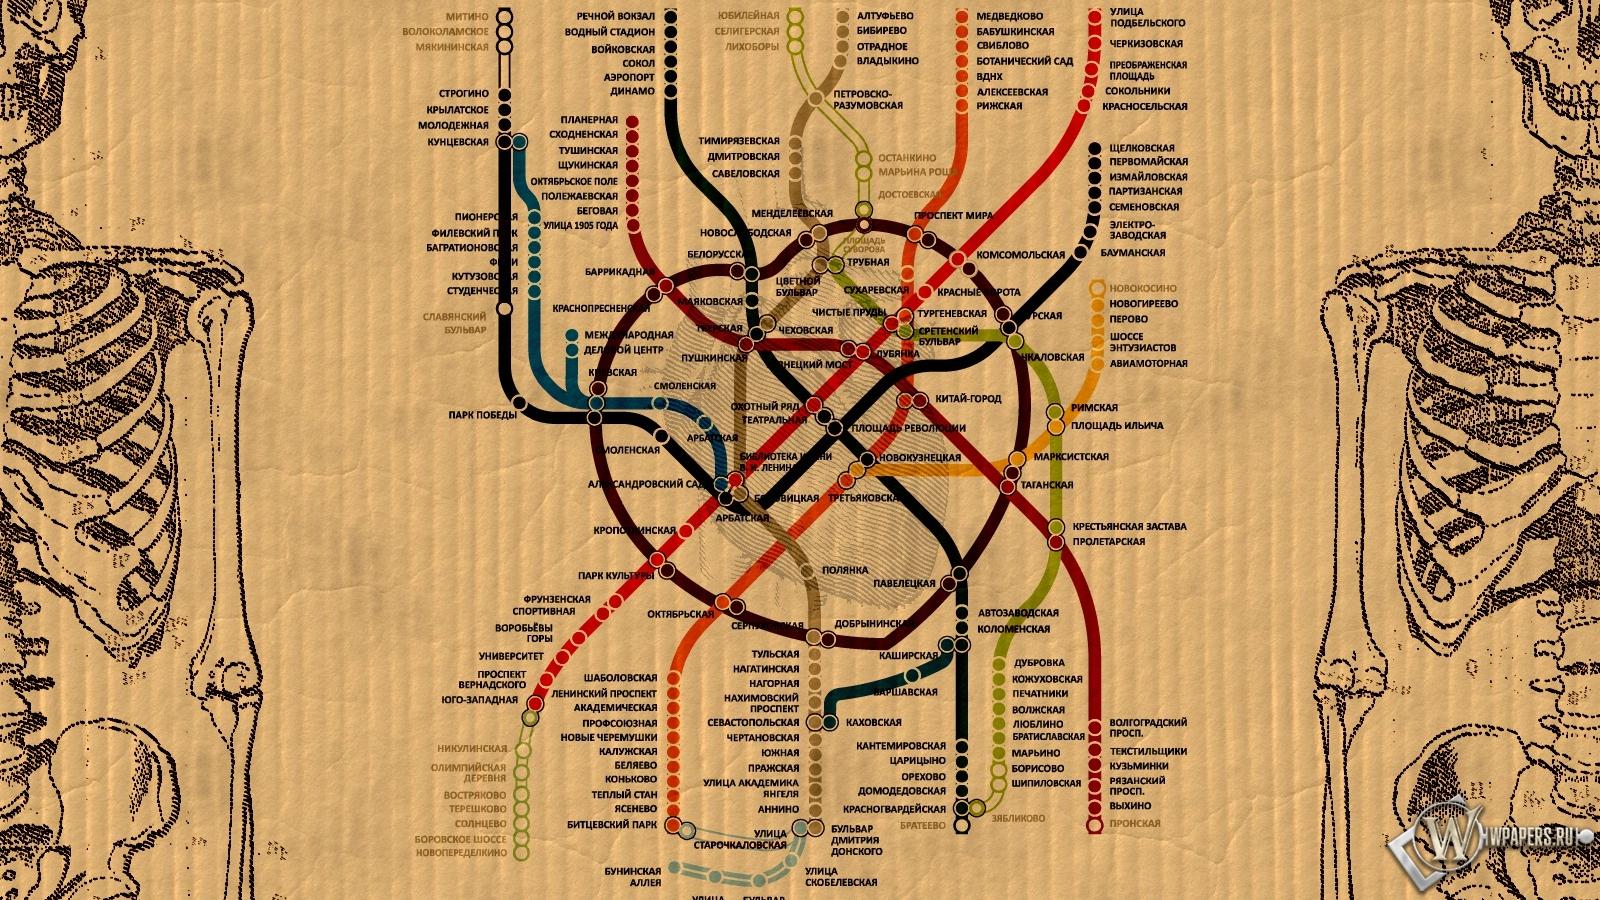 метро москвы 1600x900